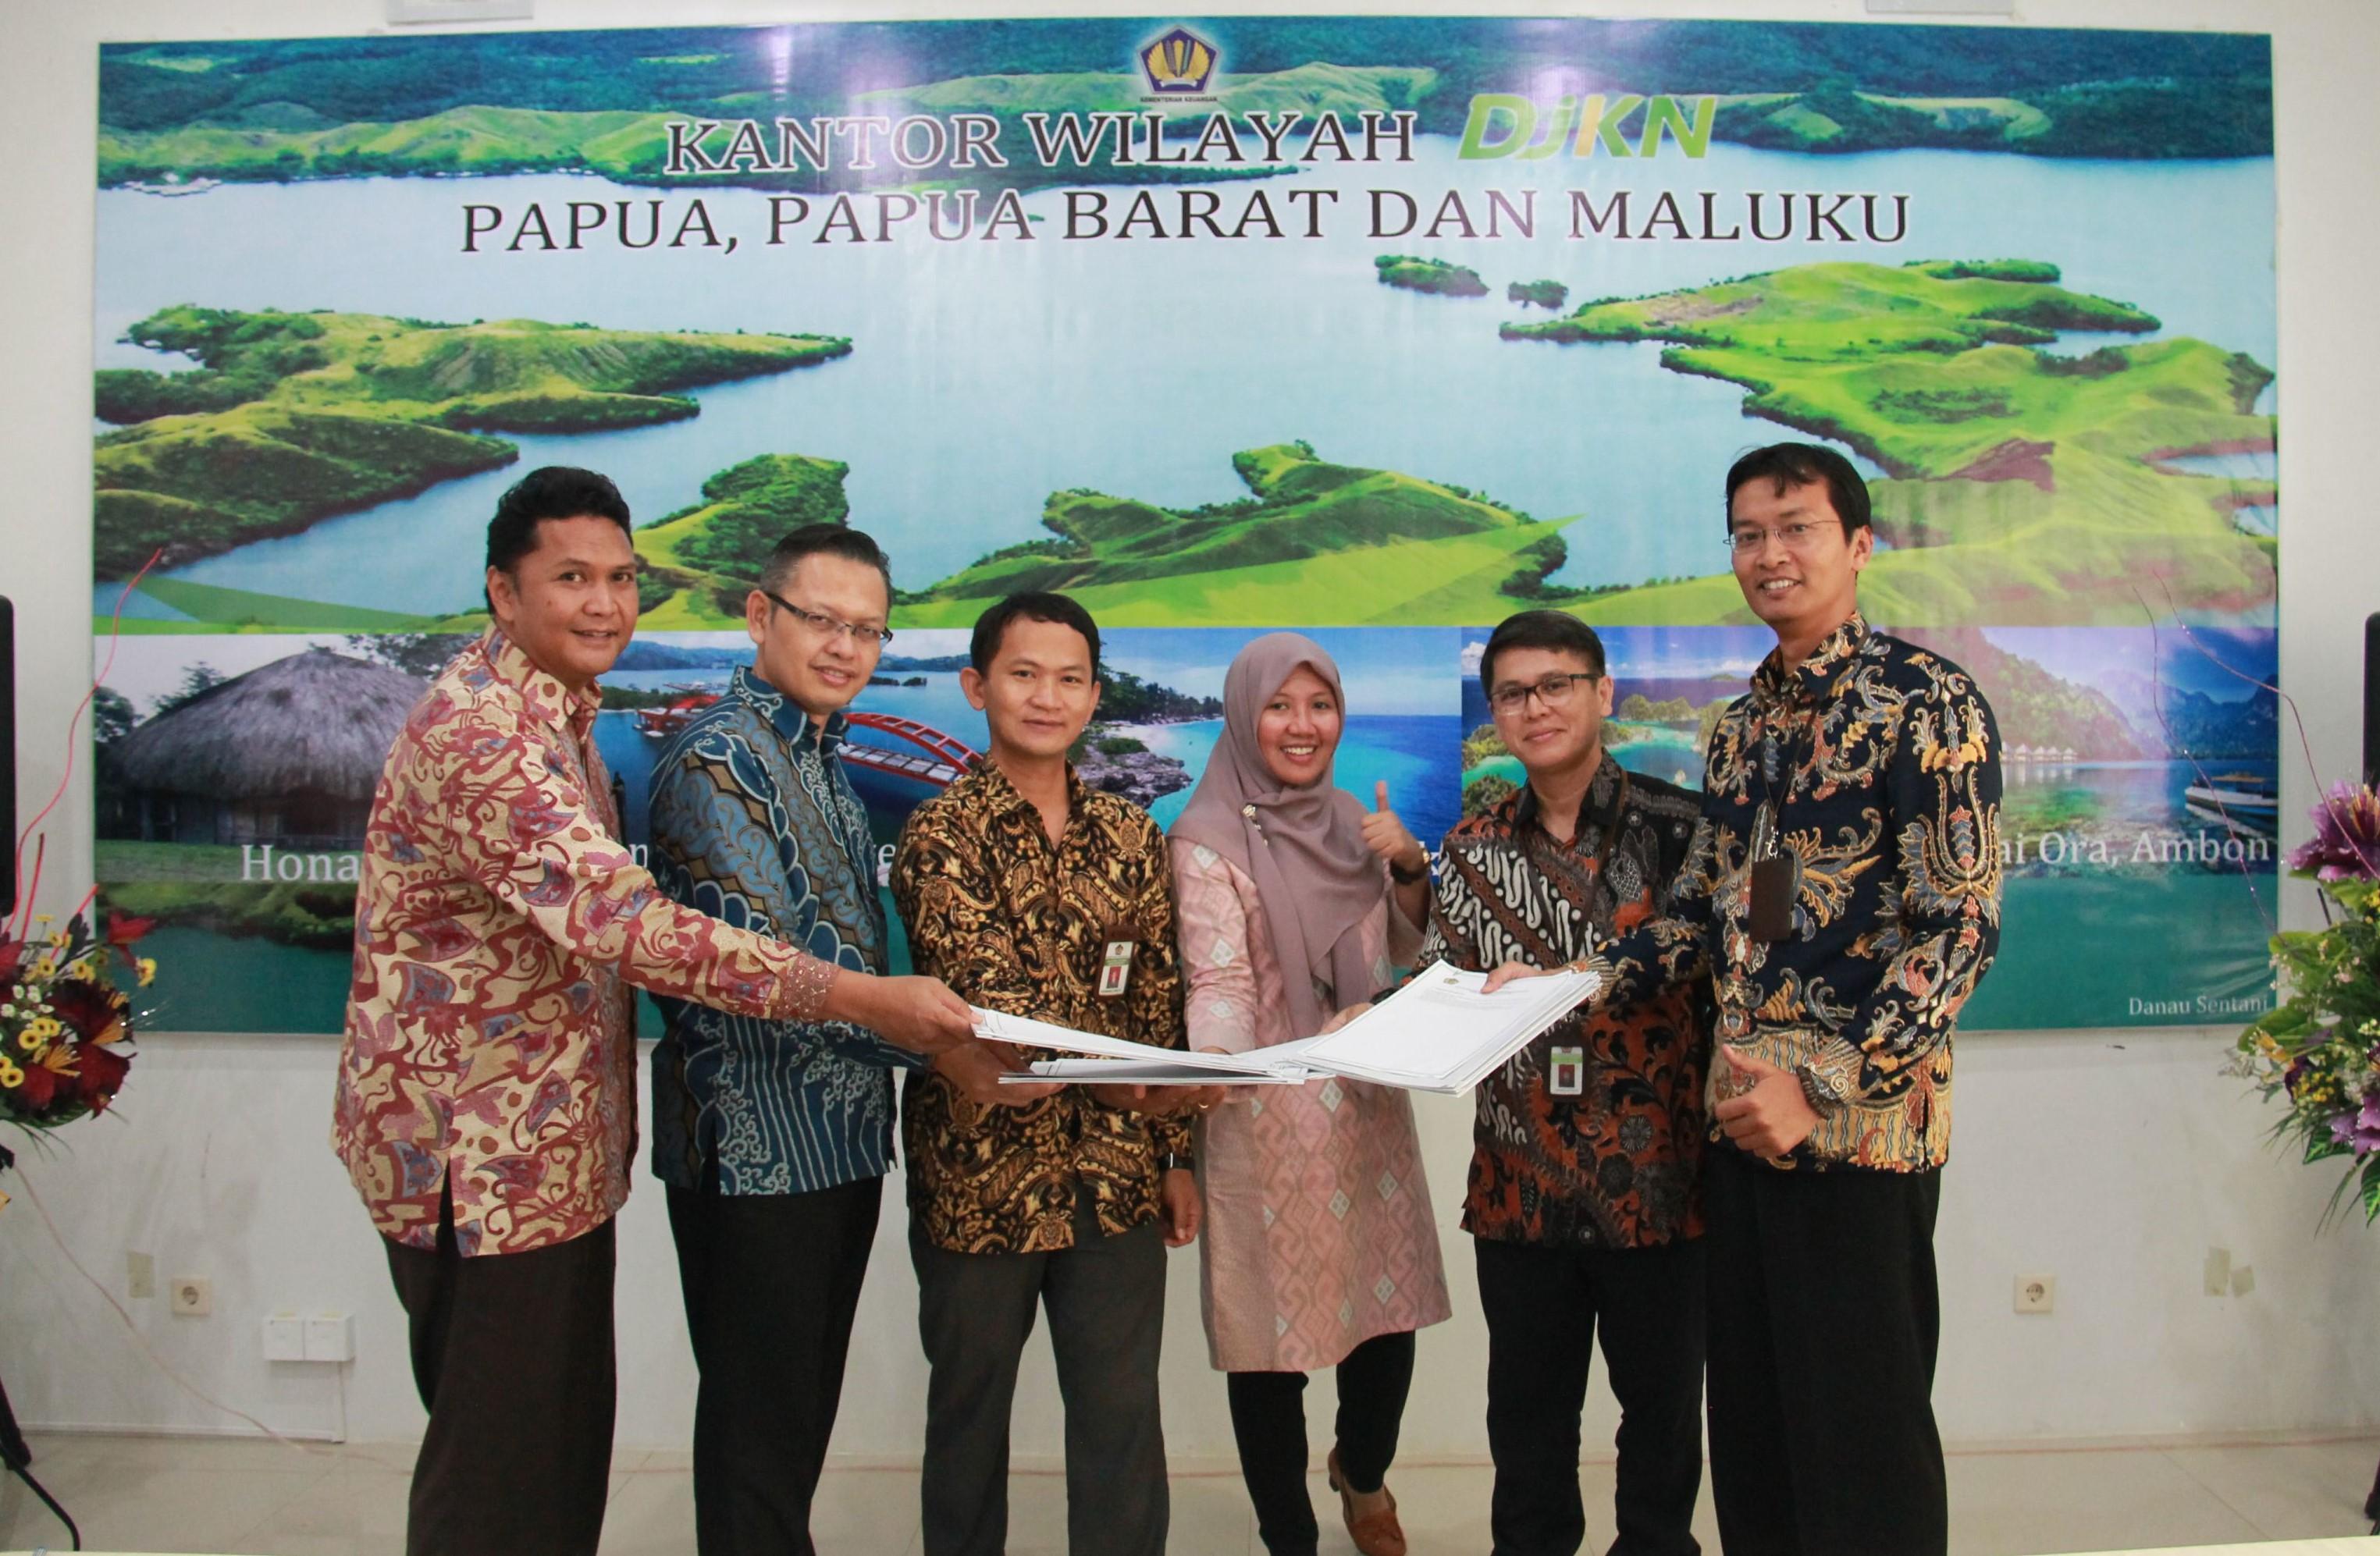 Penandatanganan Kontrak Kinerja Komplemen Eselon III Tahun 2019 Kanwil DJKN Papabaruku